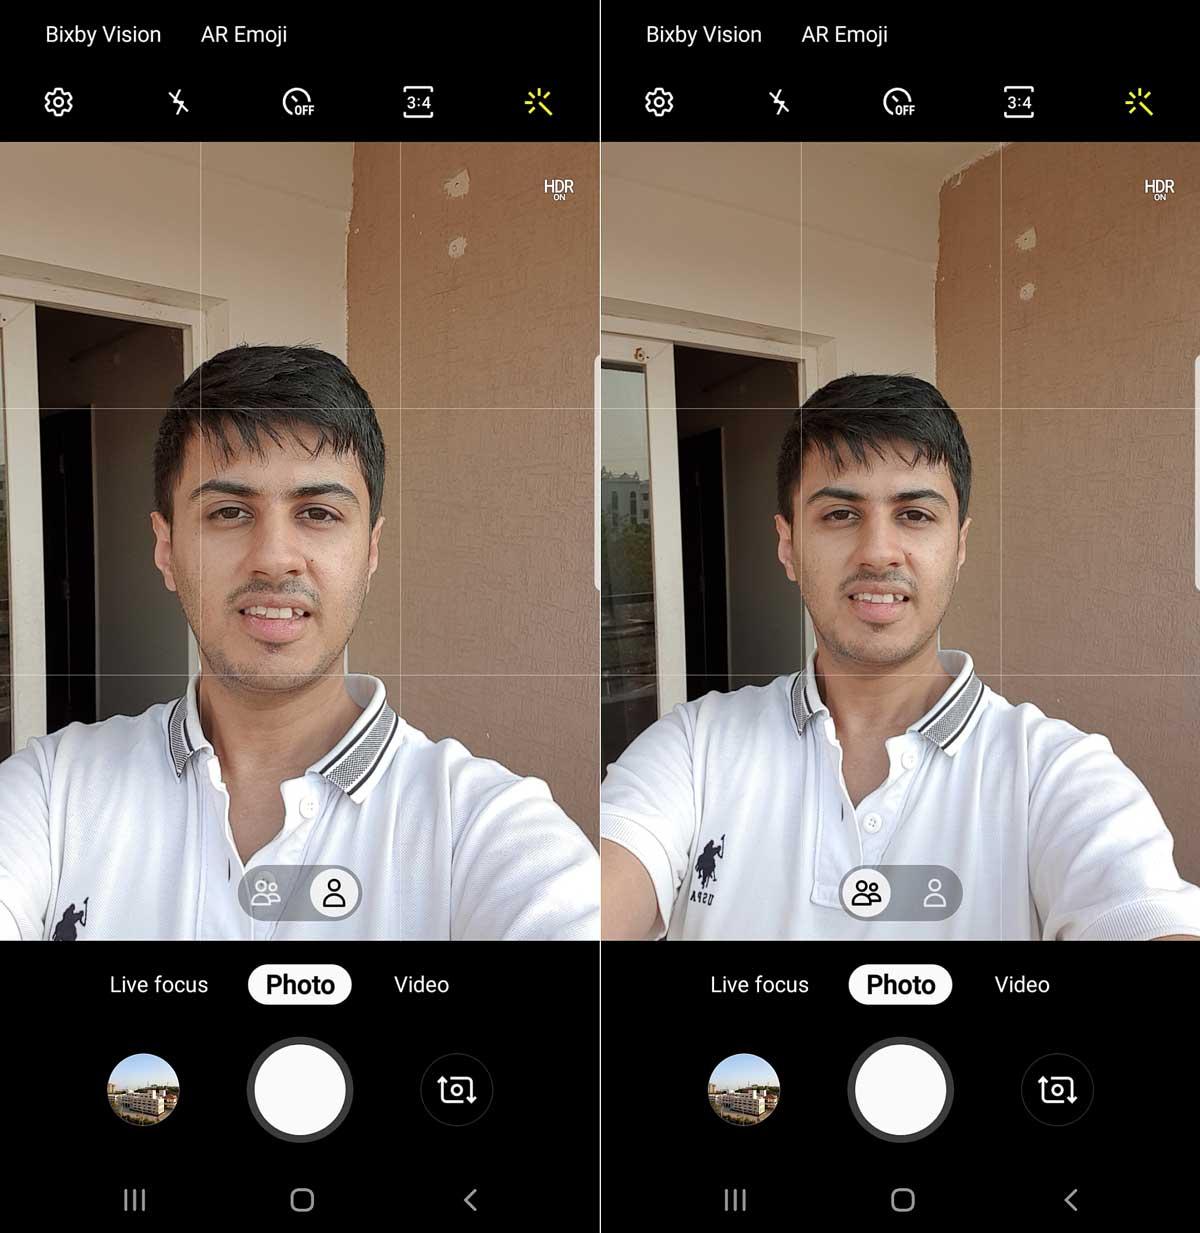 actualización abril 2019 Samsung Galaxy Note 9 cámara frontal